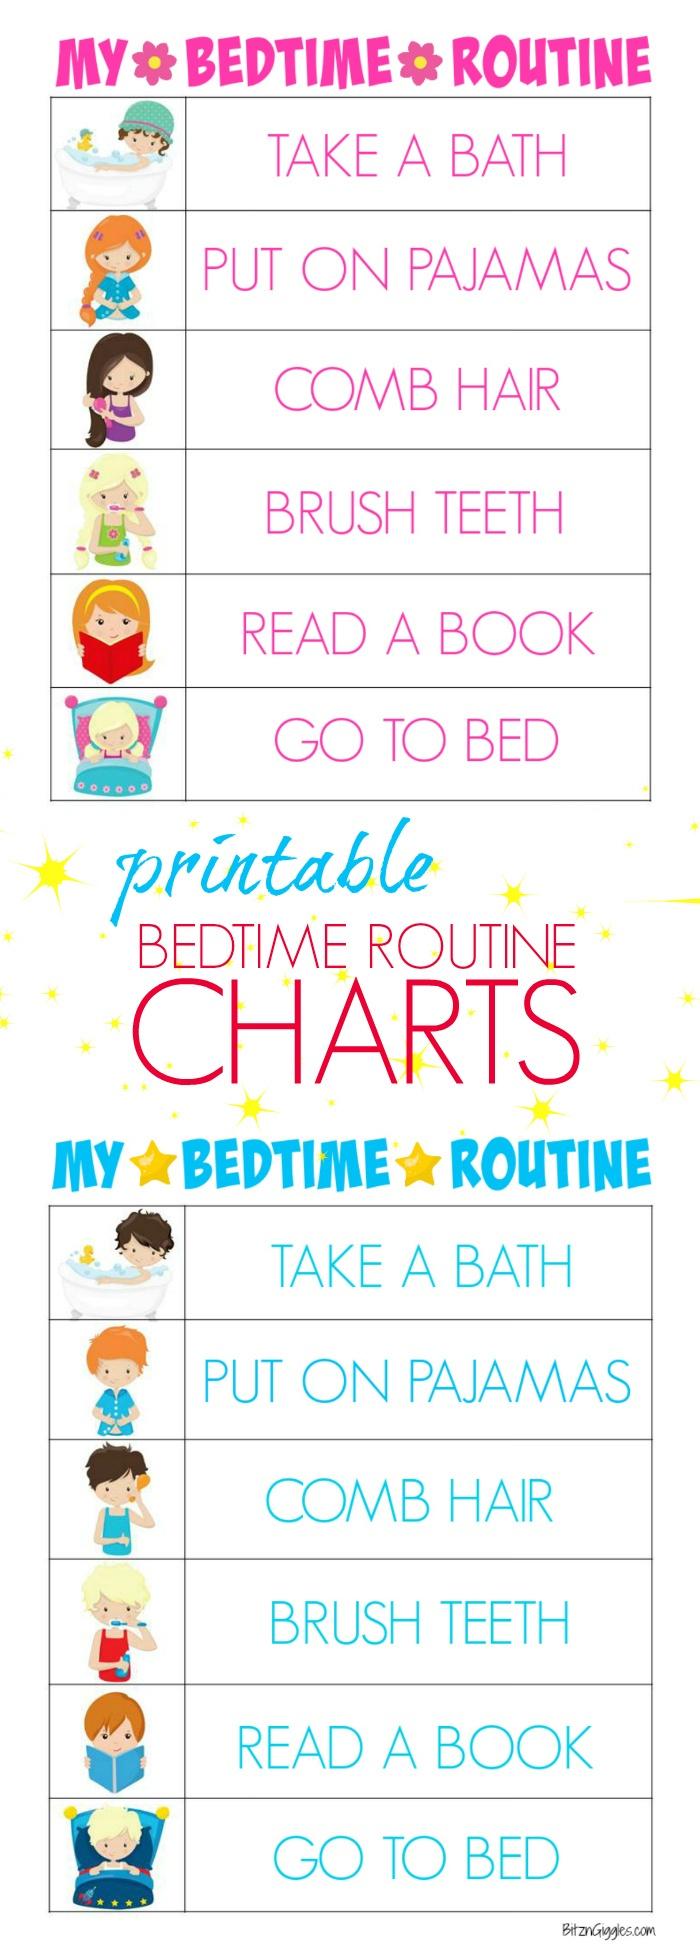 Printable Bedtime Routine Charts - Bitz & Giggles - Free Printable Morning Routine Charts With Pictures